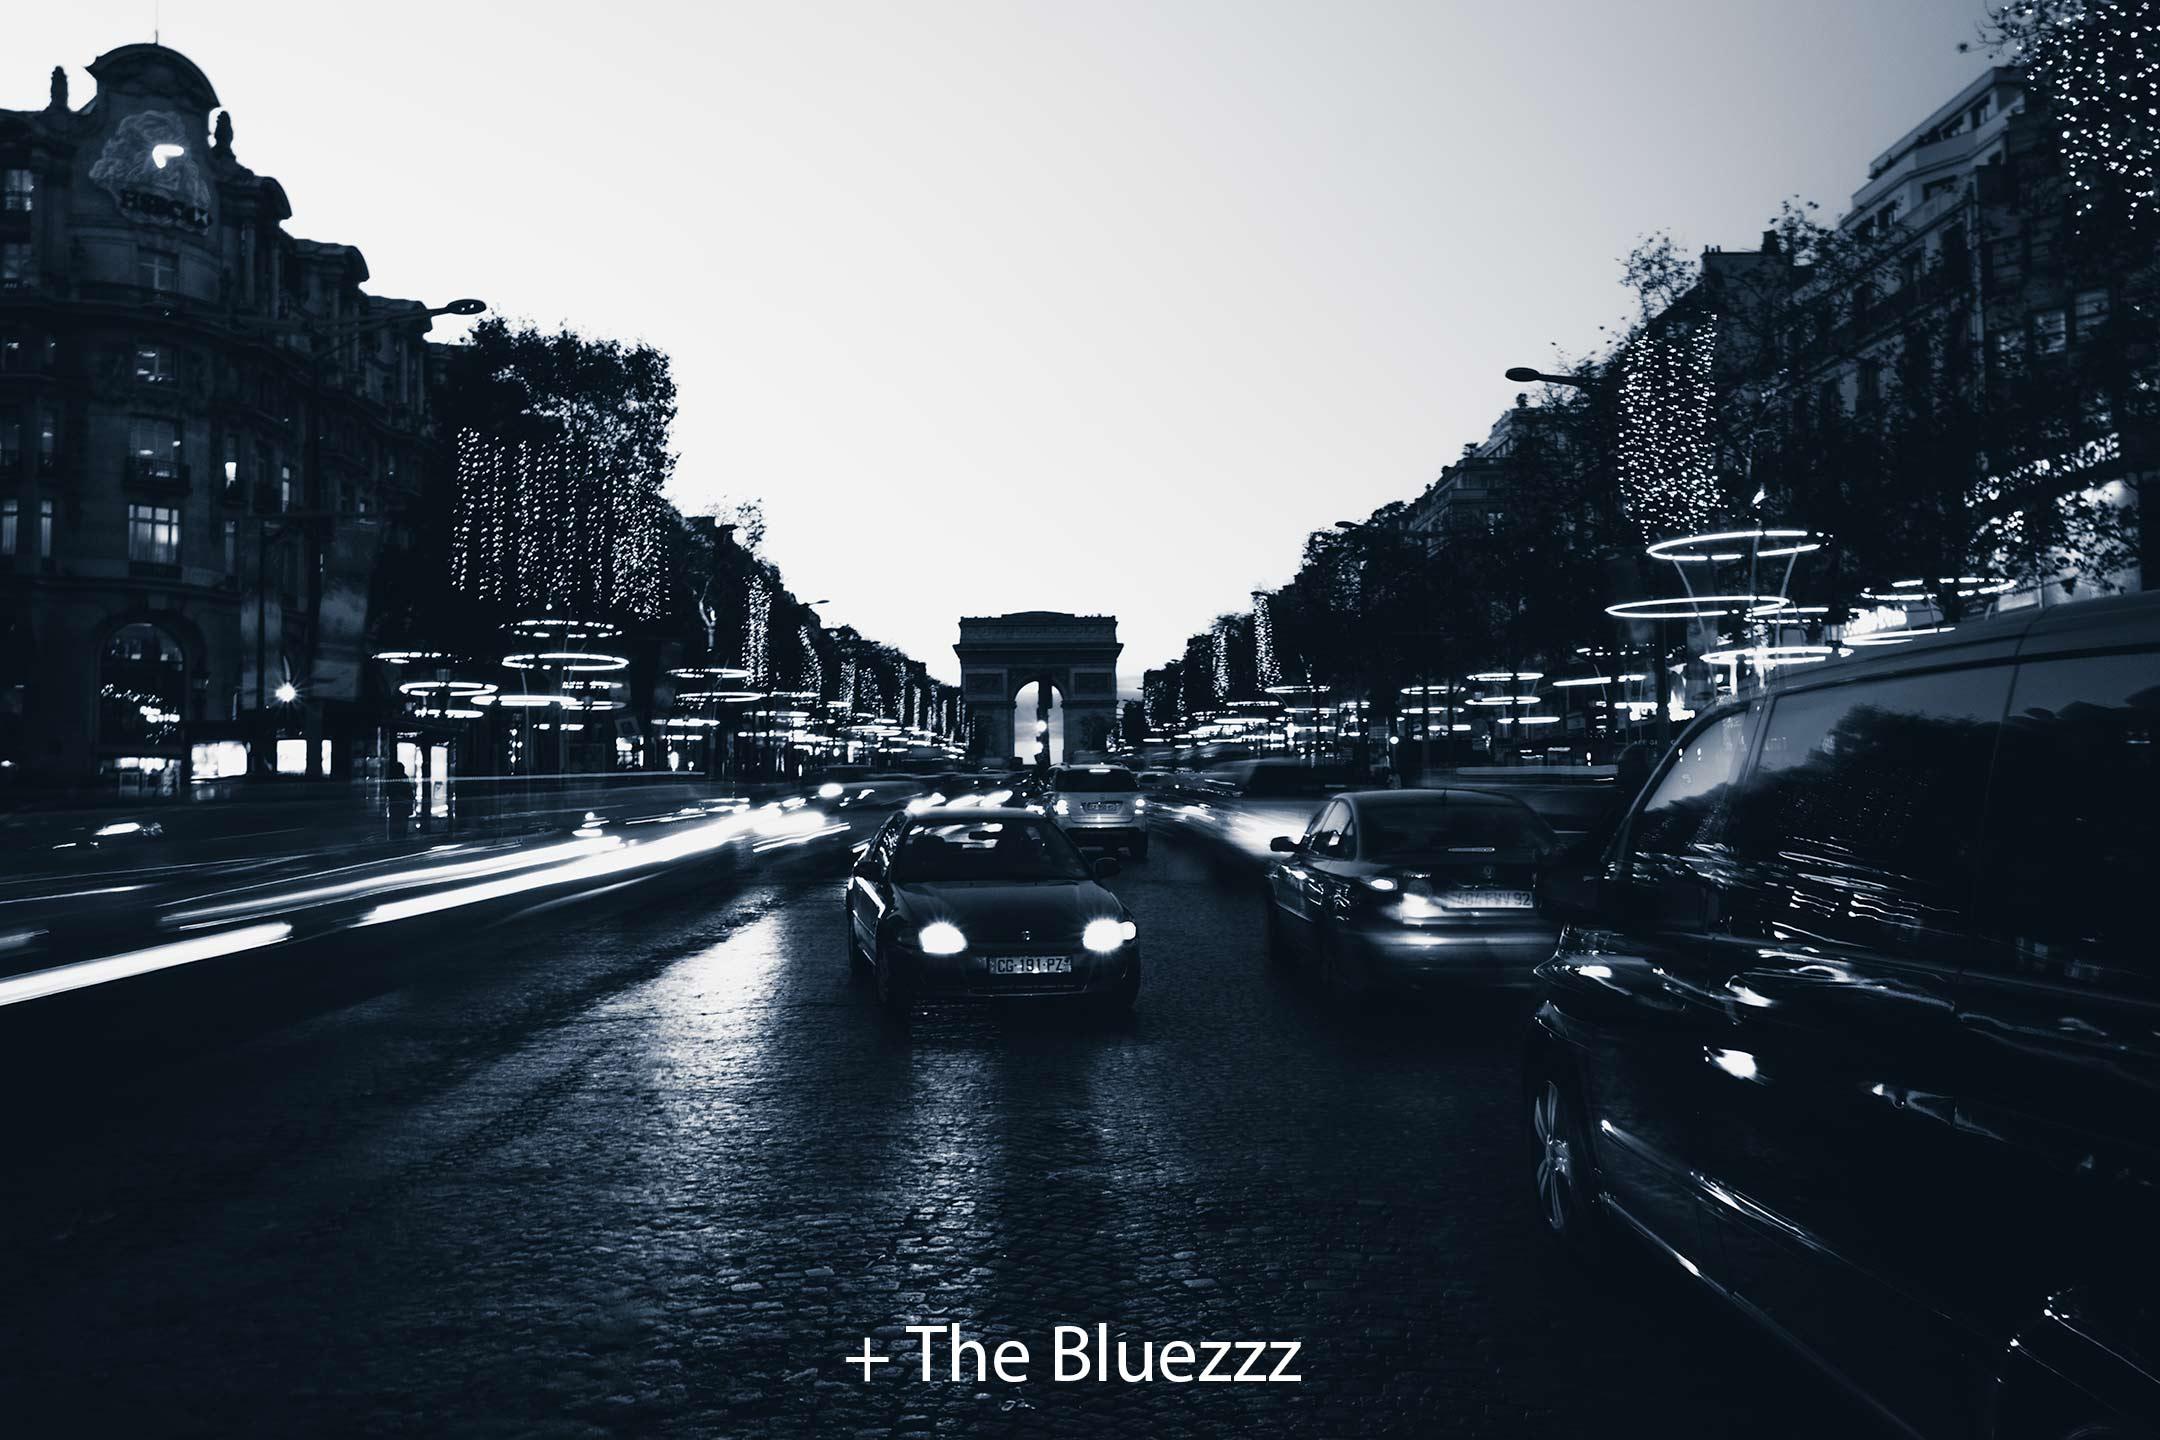 The Bluezzz 1.jpg